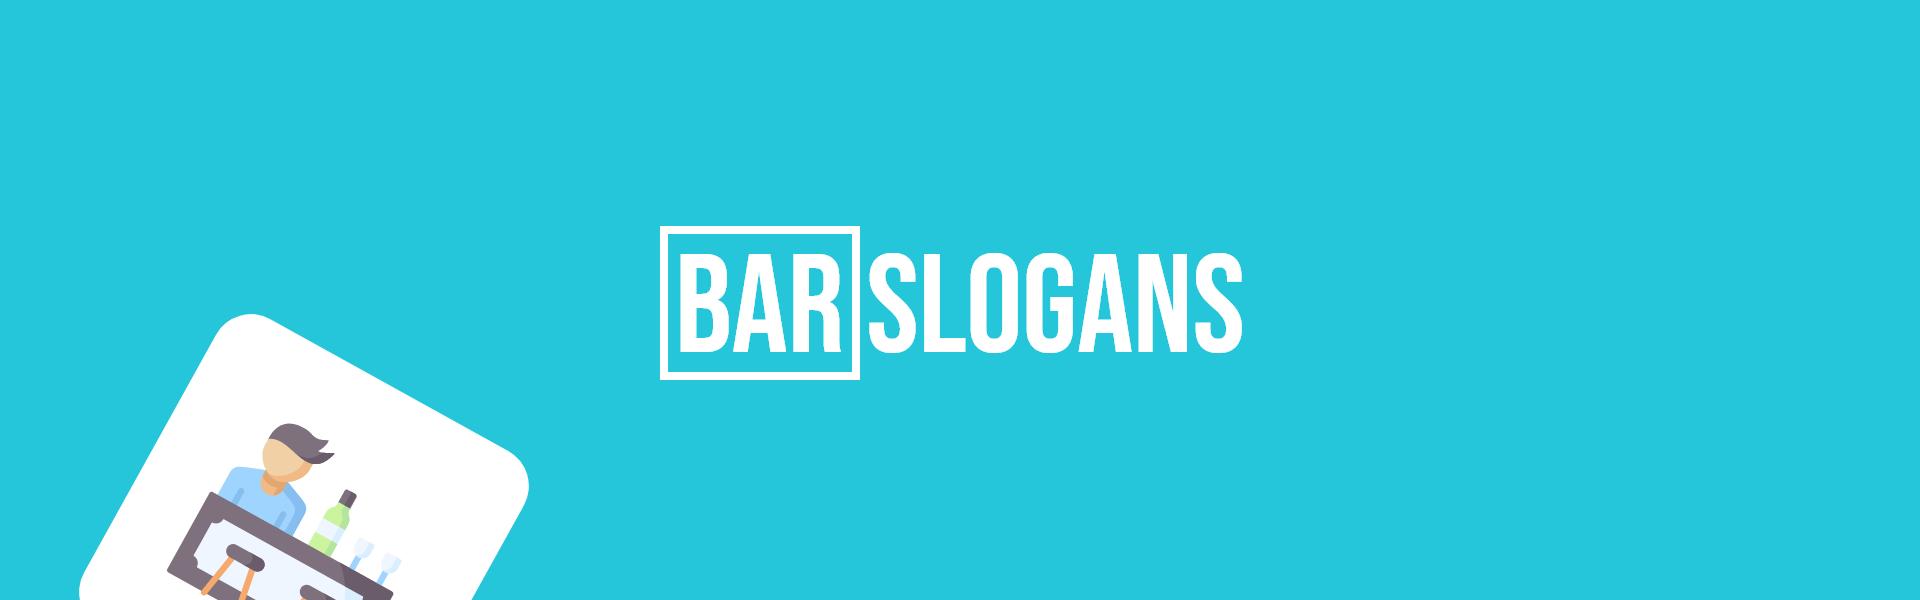 bar slogans taglines